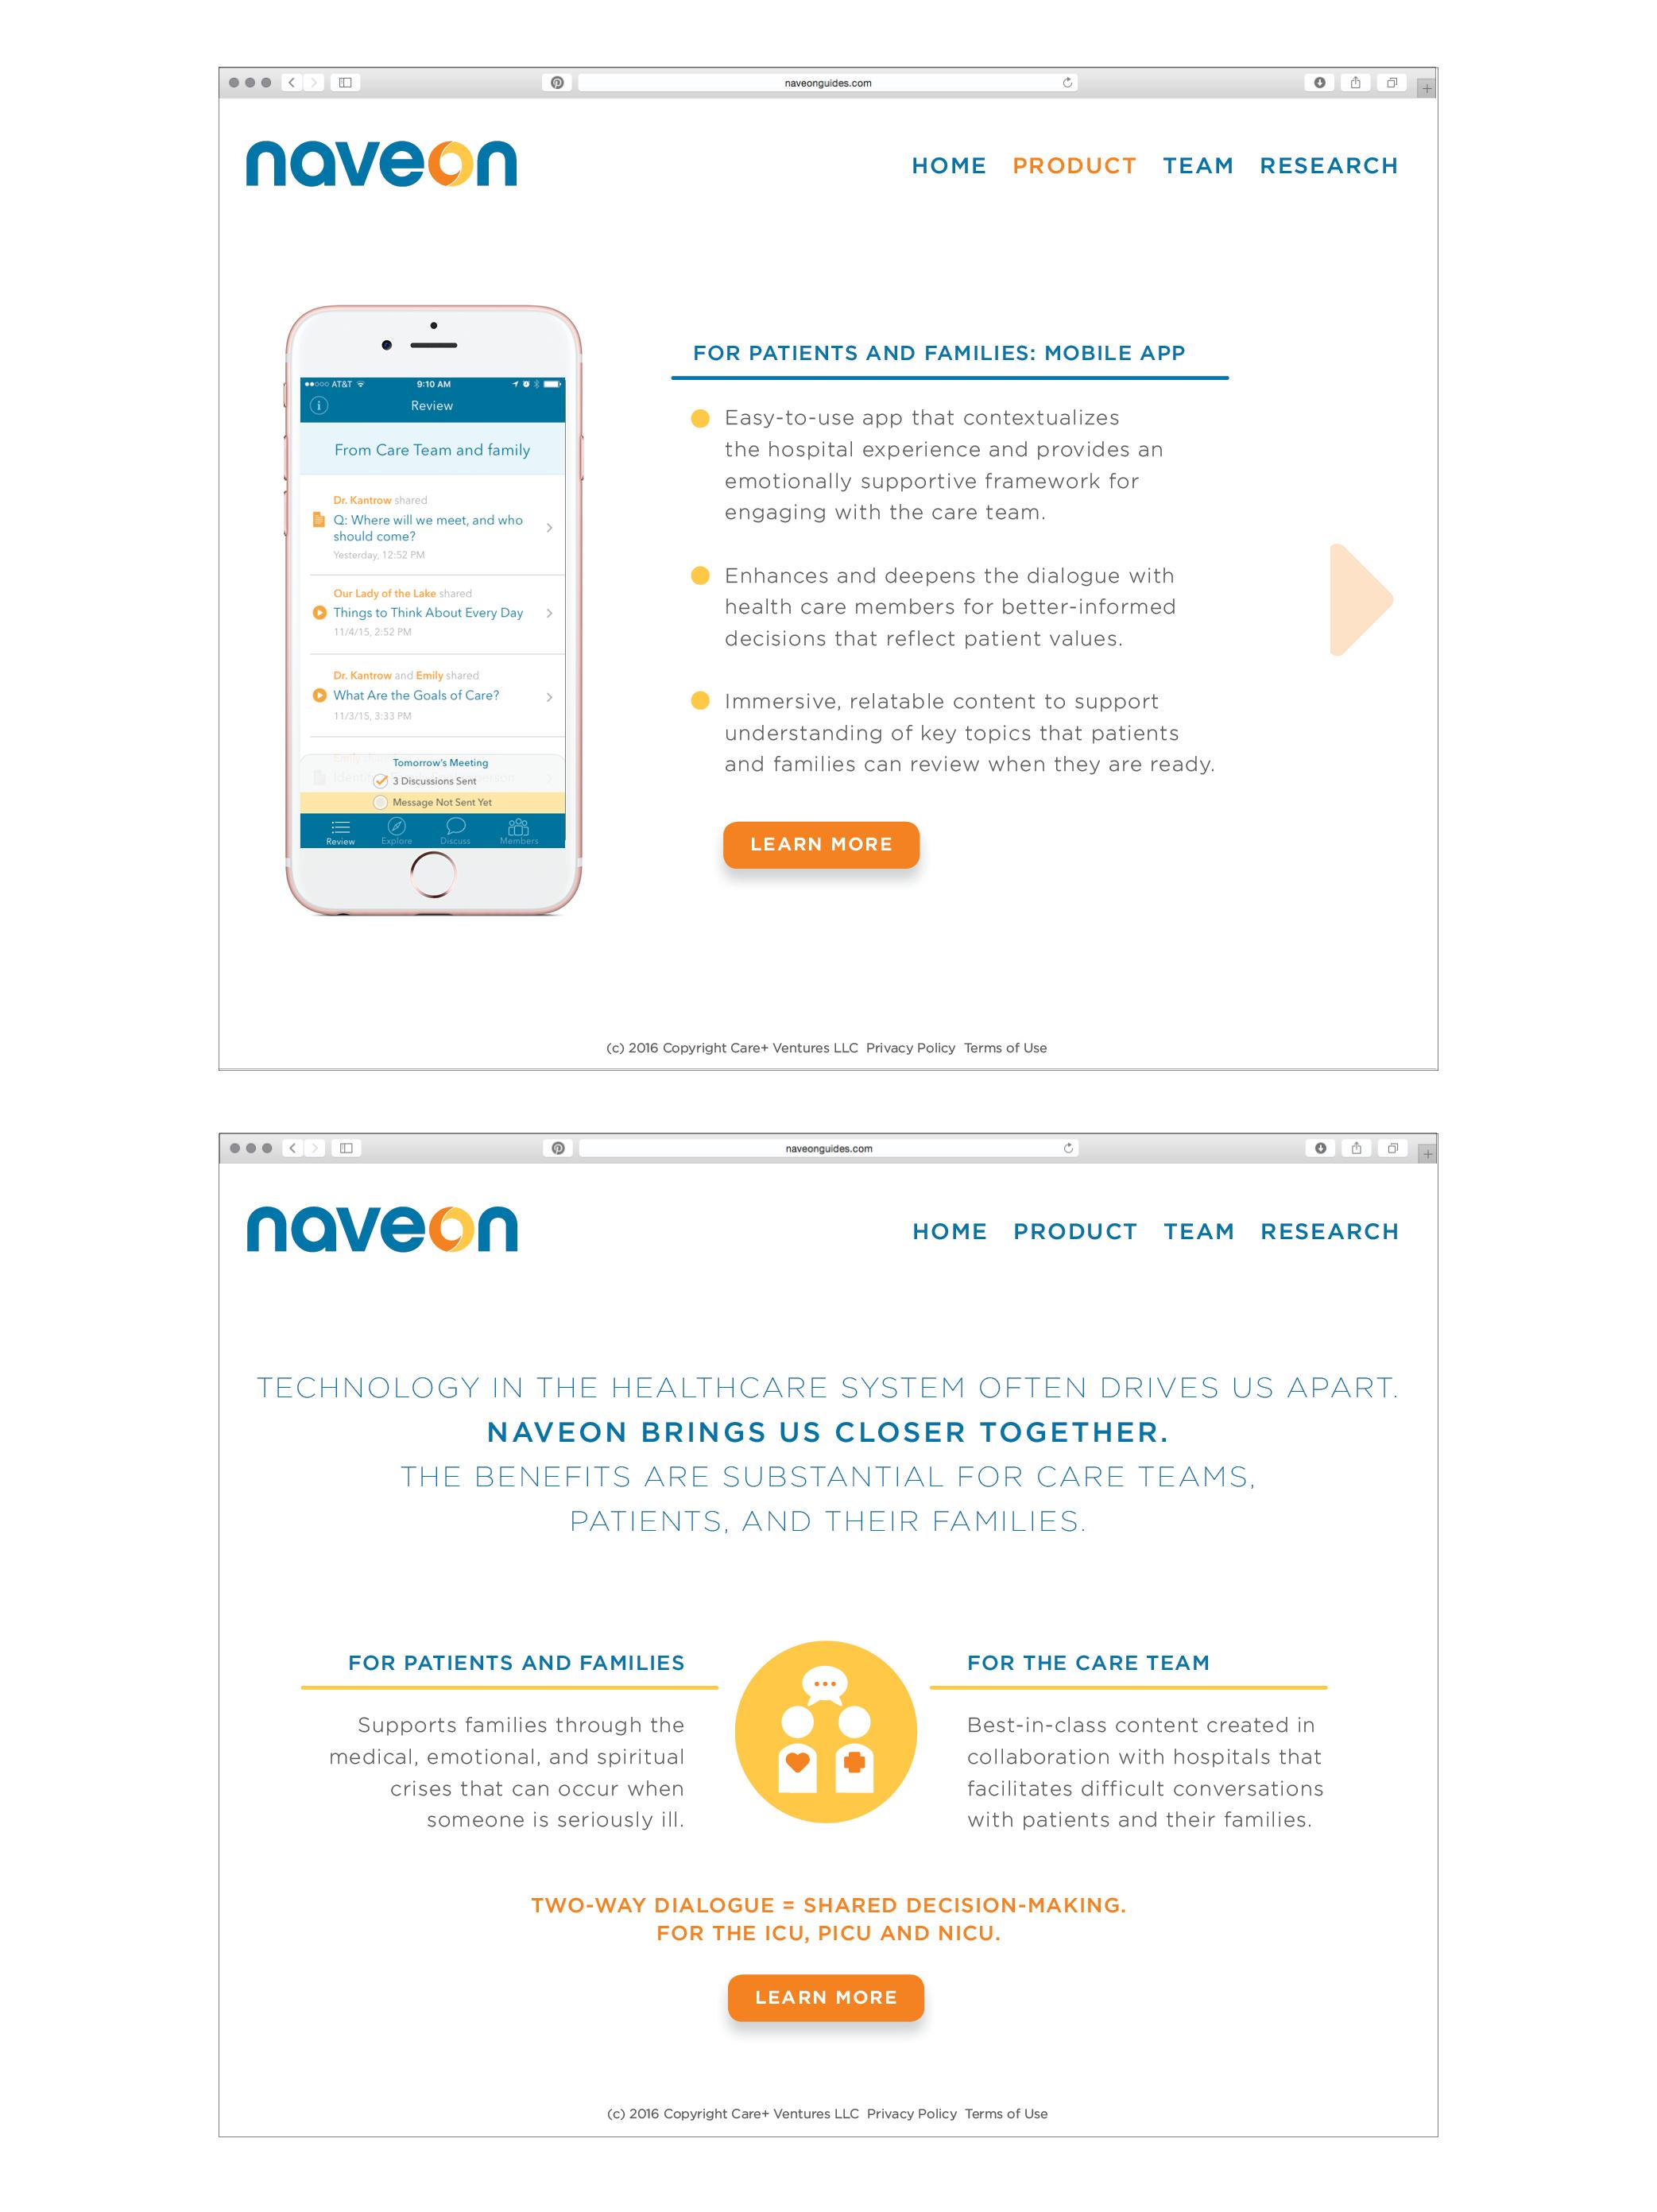 Naveon slideshow images5.jpg